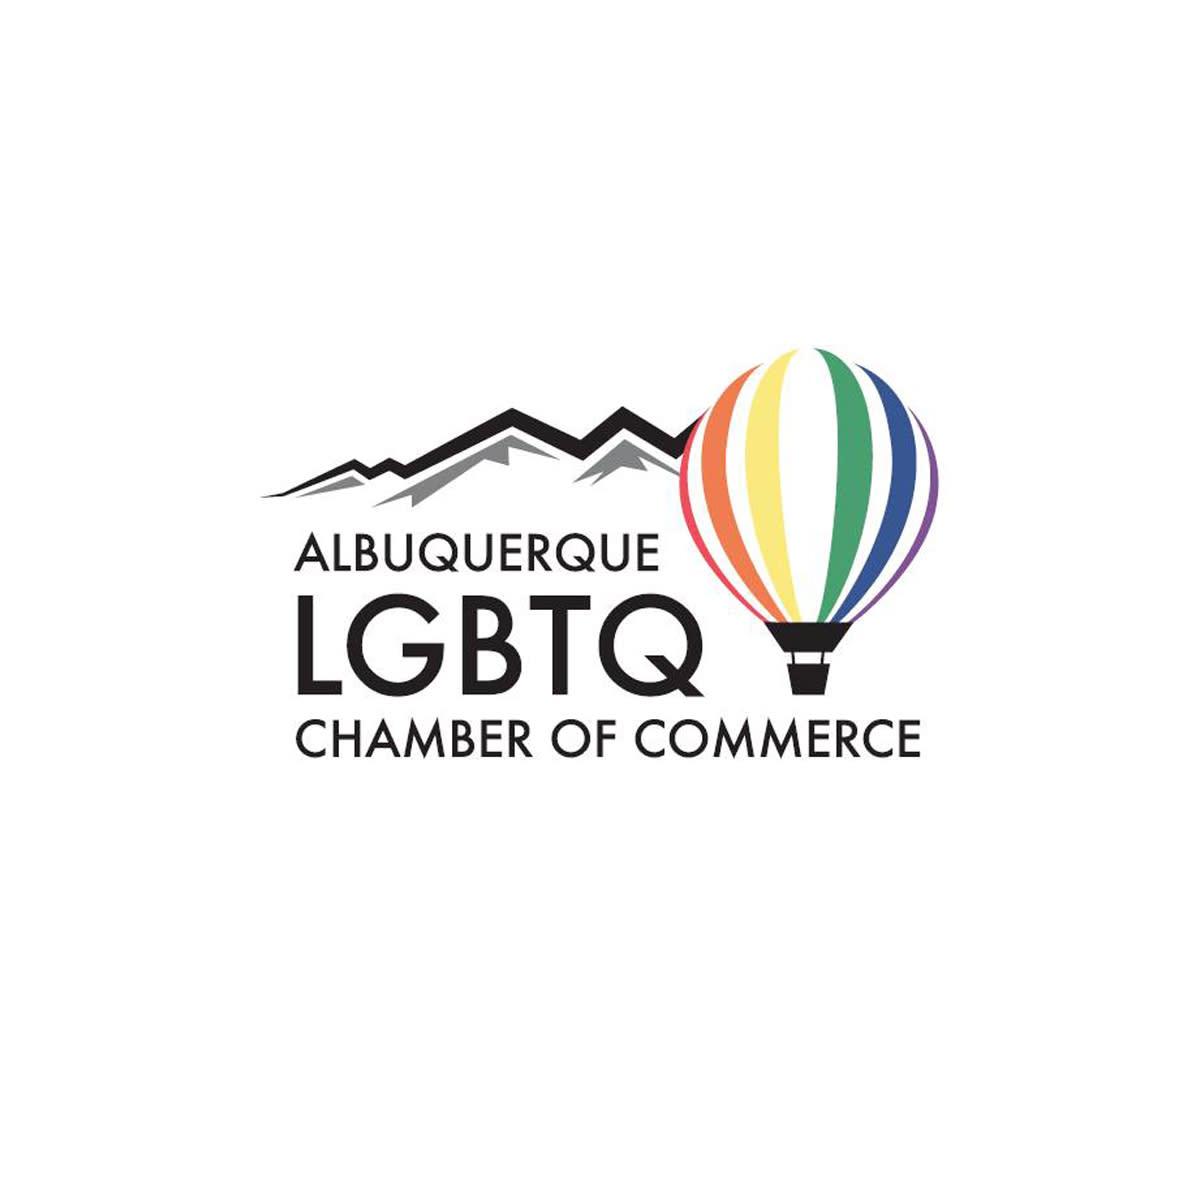 Albuquerque LGBTQ Chamber of Commerce